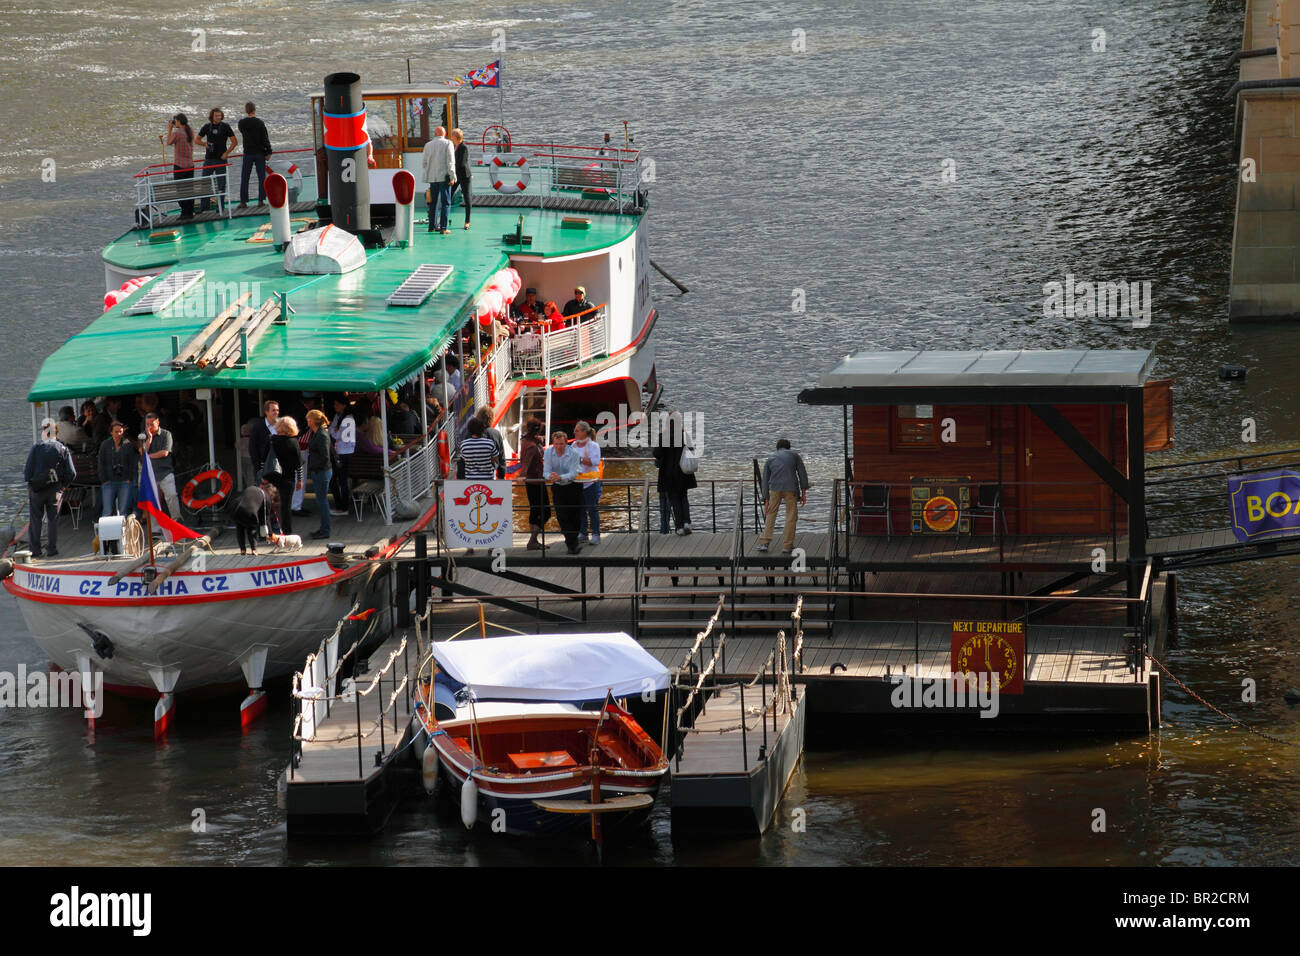 Wharfing (boat landing - laddering) boat at Vltava River, in Prague, Czech Republic August 2010 - Stock Image